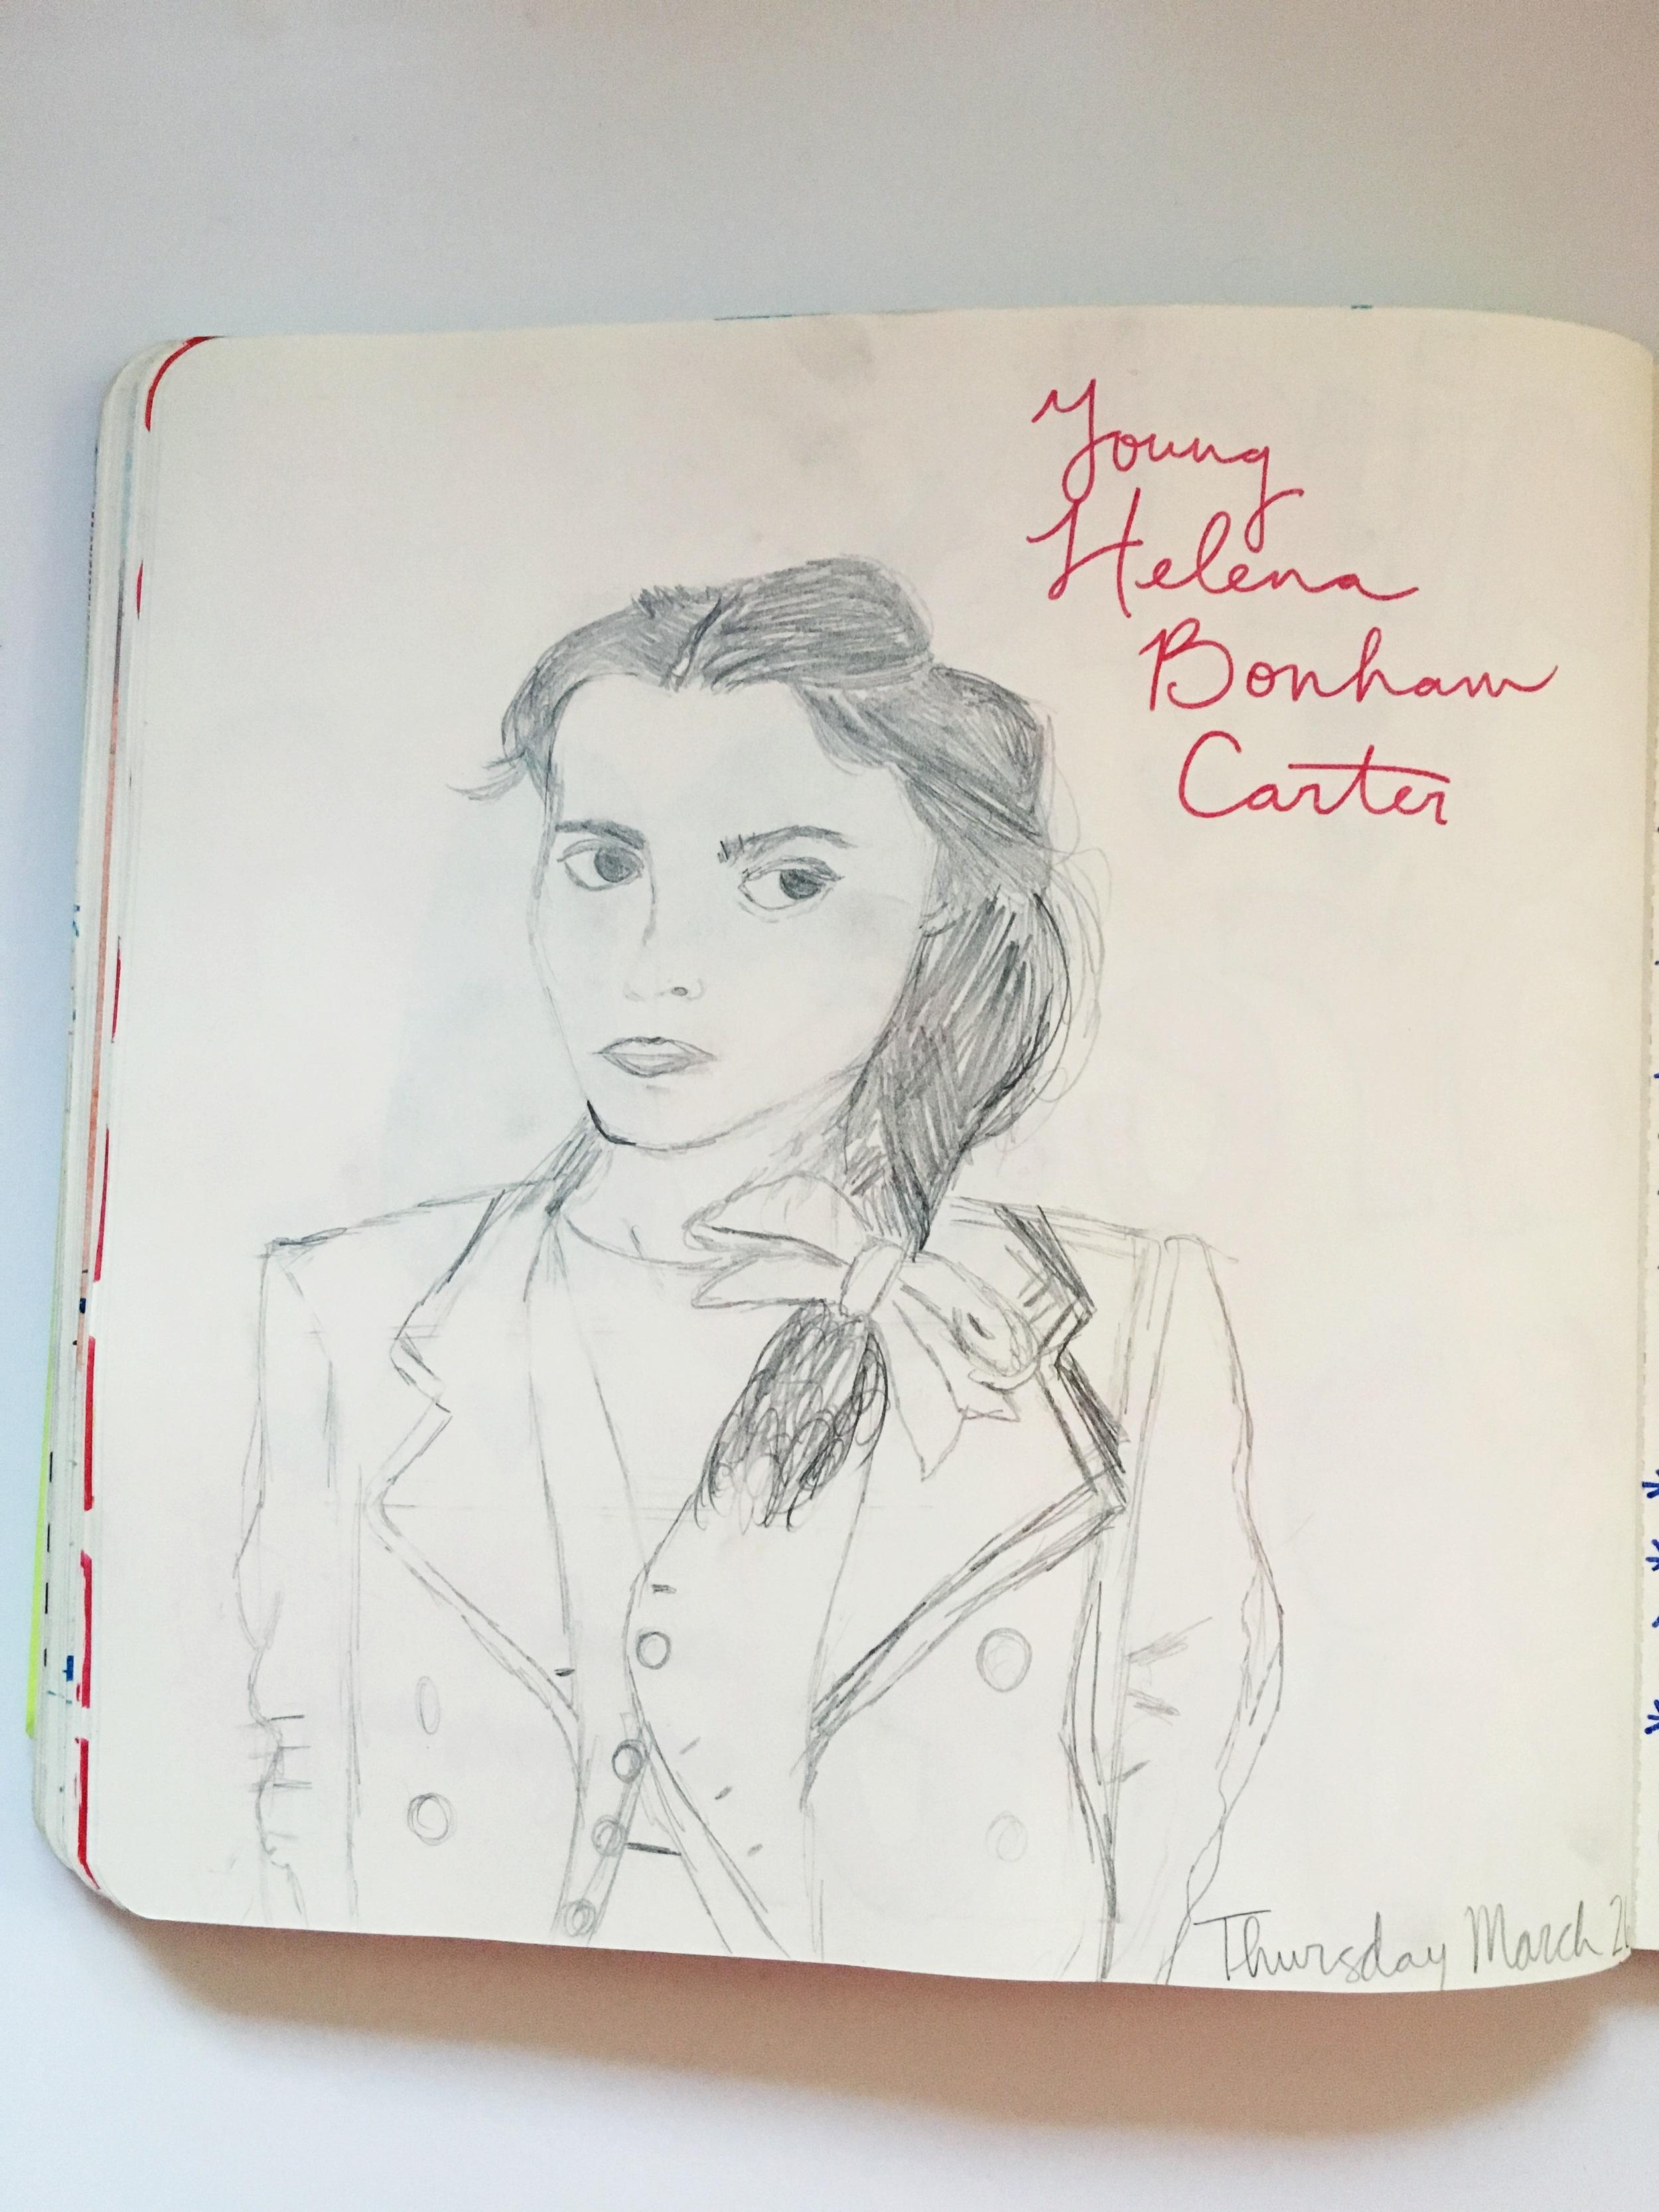 Anything Goes Journal Helena Bonham Carter